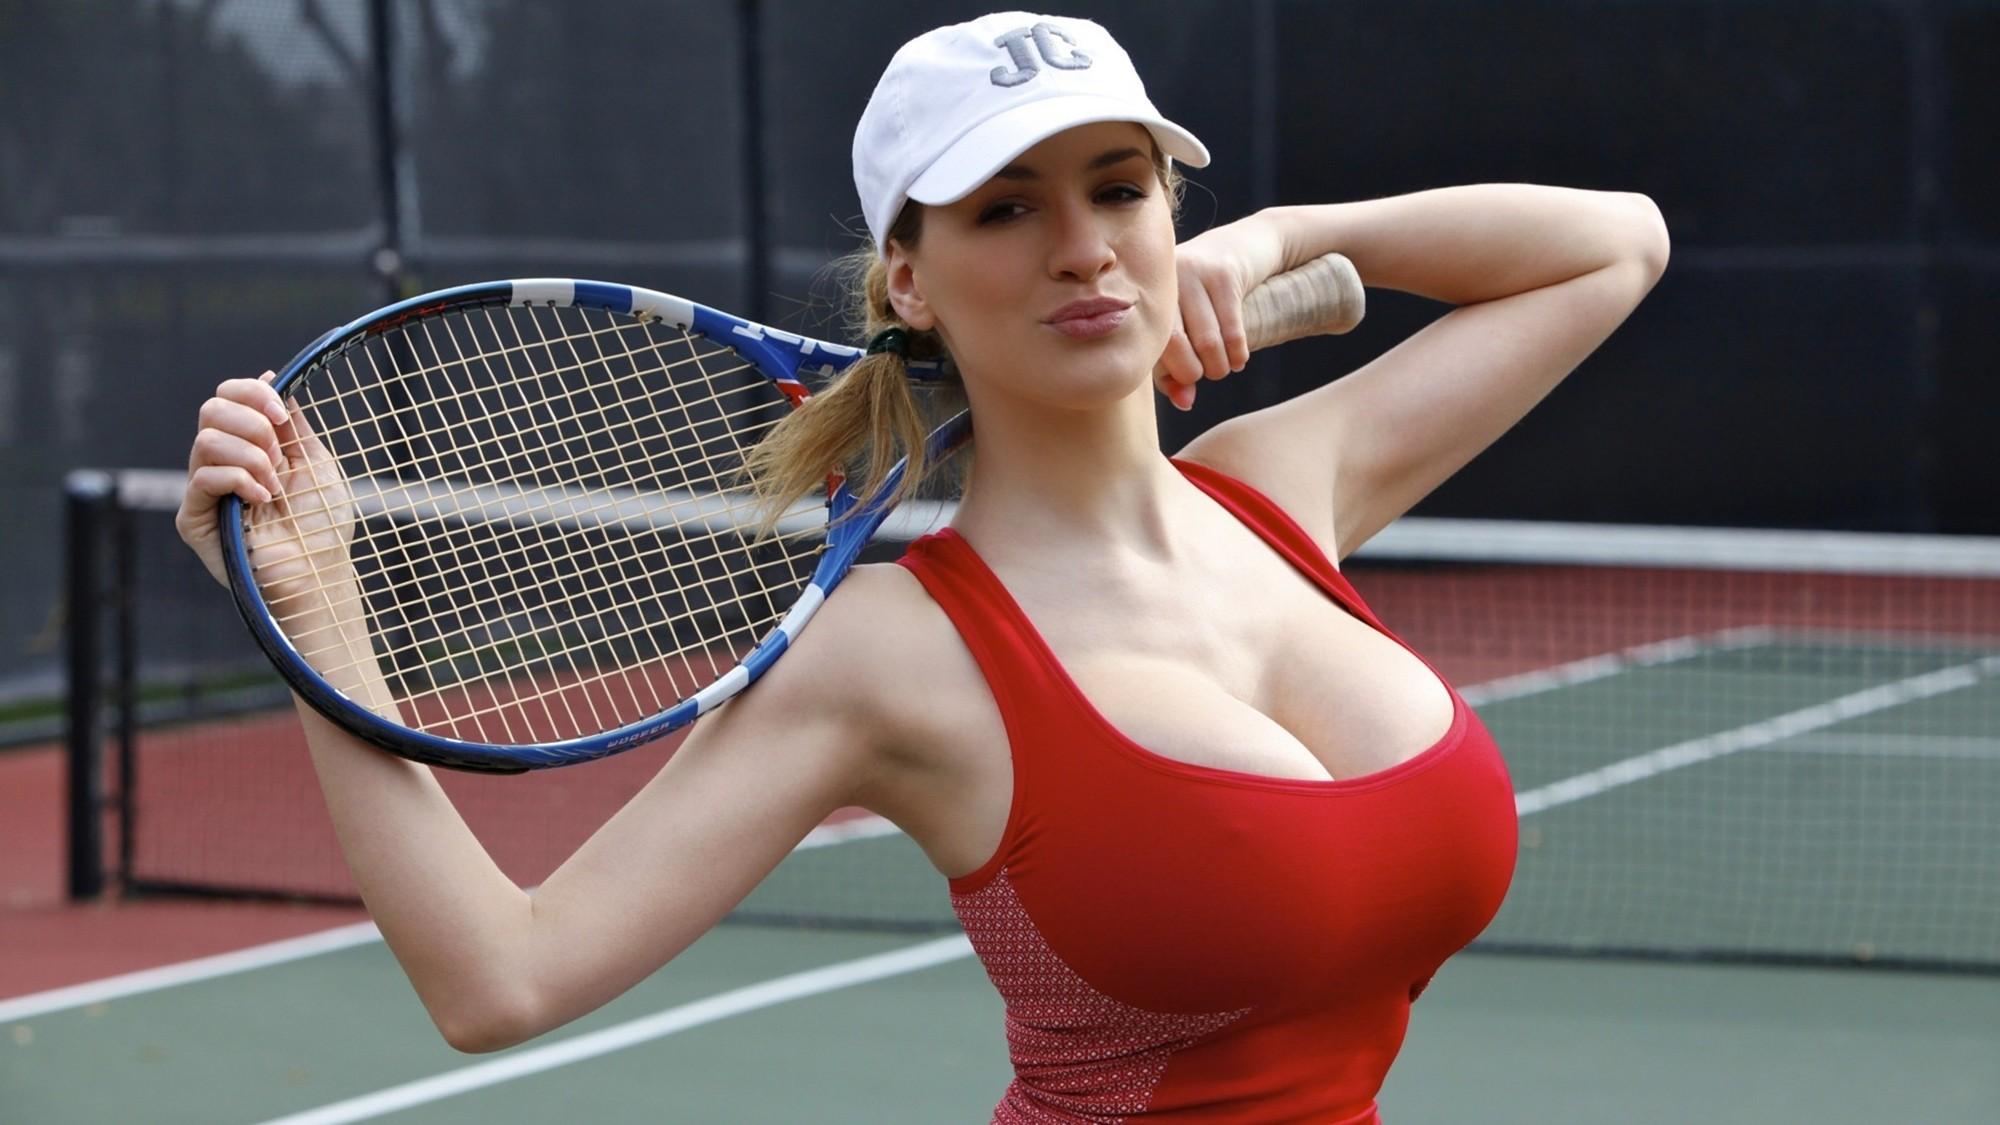 People 2000x1125 women boobs tennis Jordan Carver armpits Hugos cleavage hard nipples big boobs huge breasts tennis rackets looking at viewer tennis court tennis courts women outdoors